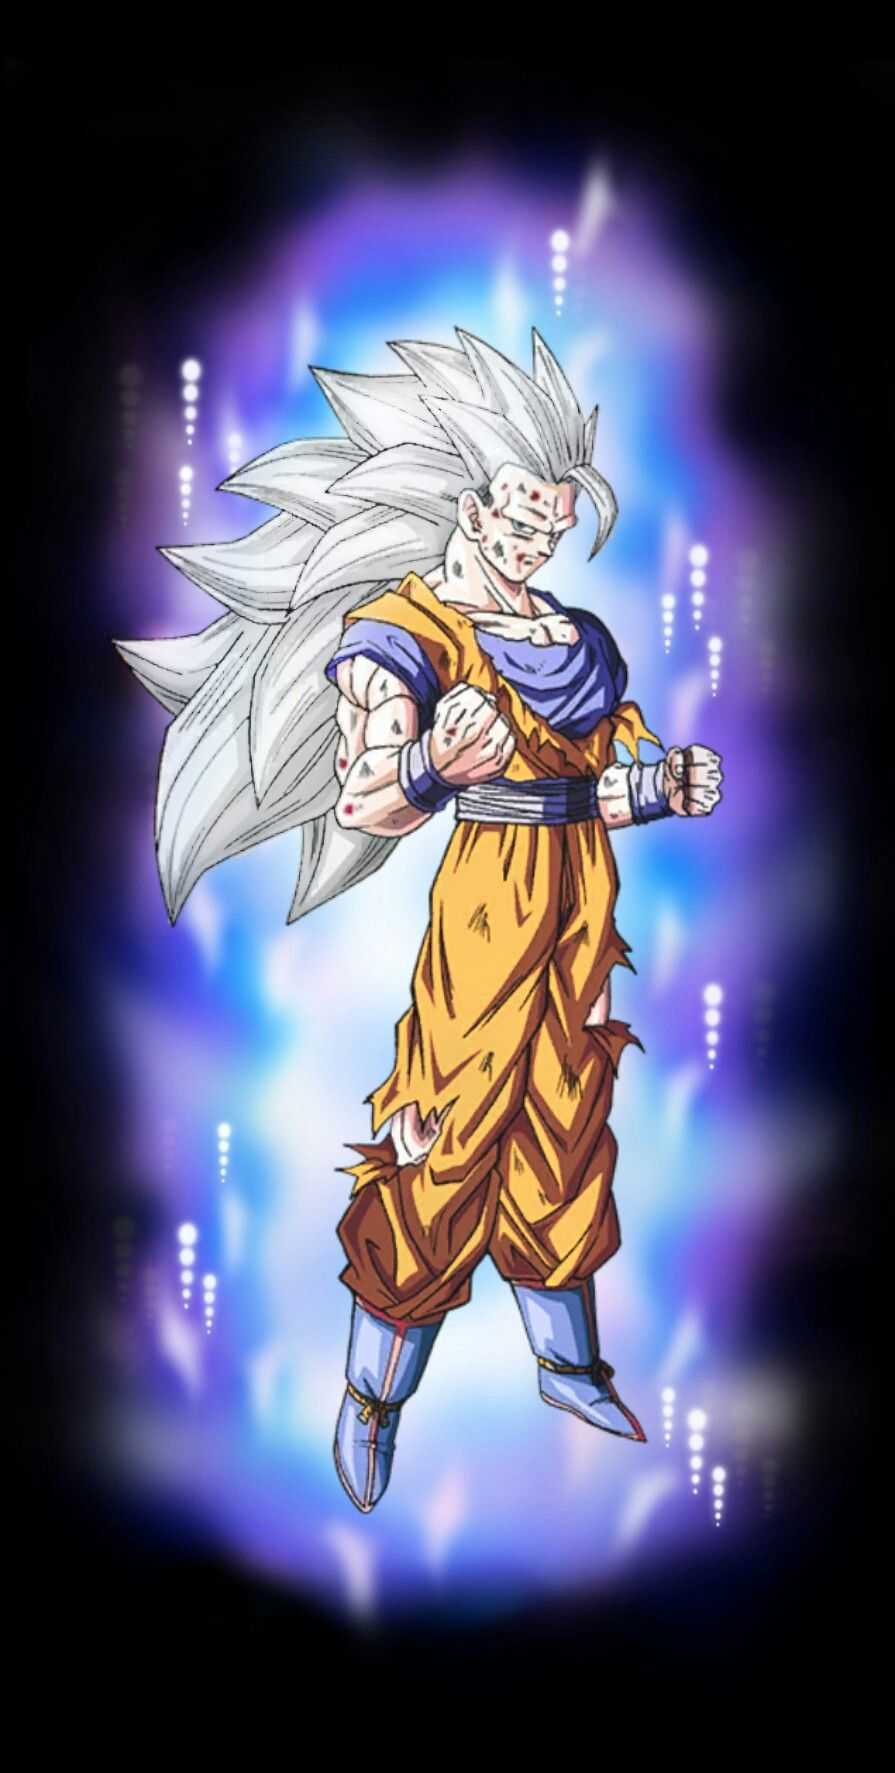 Goku Ssj3 Mastered Ultra Instinct Dragon Ball Super Personajes De Dragon Ball Fotos Goku Dragones